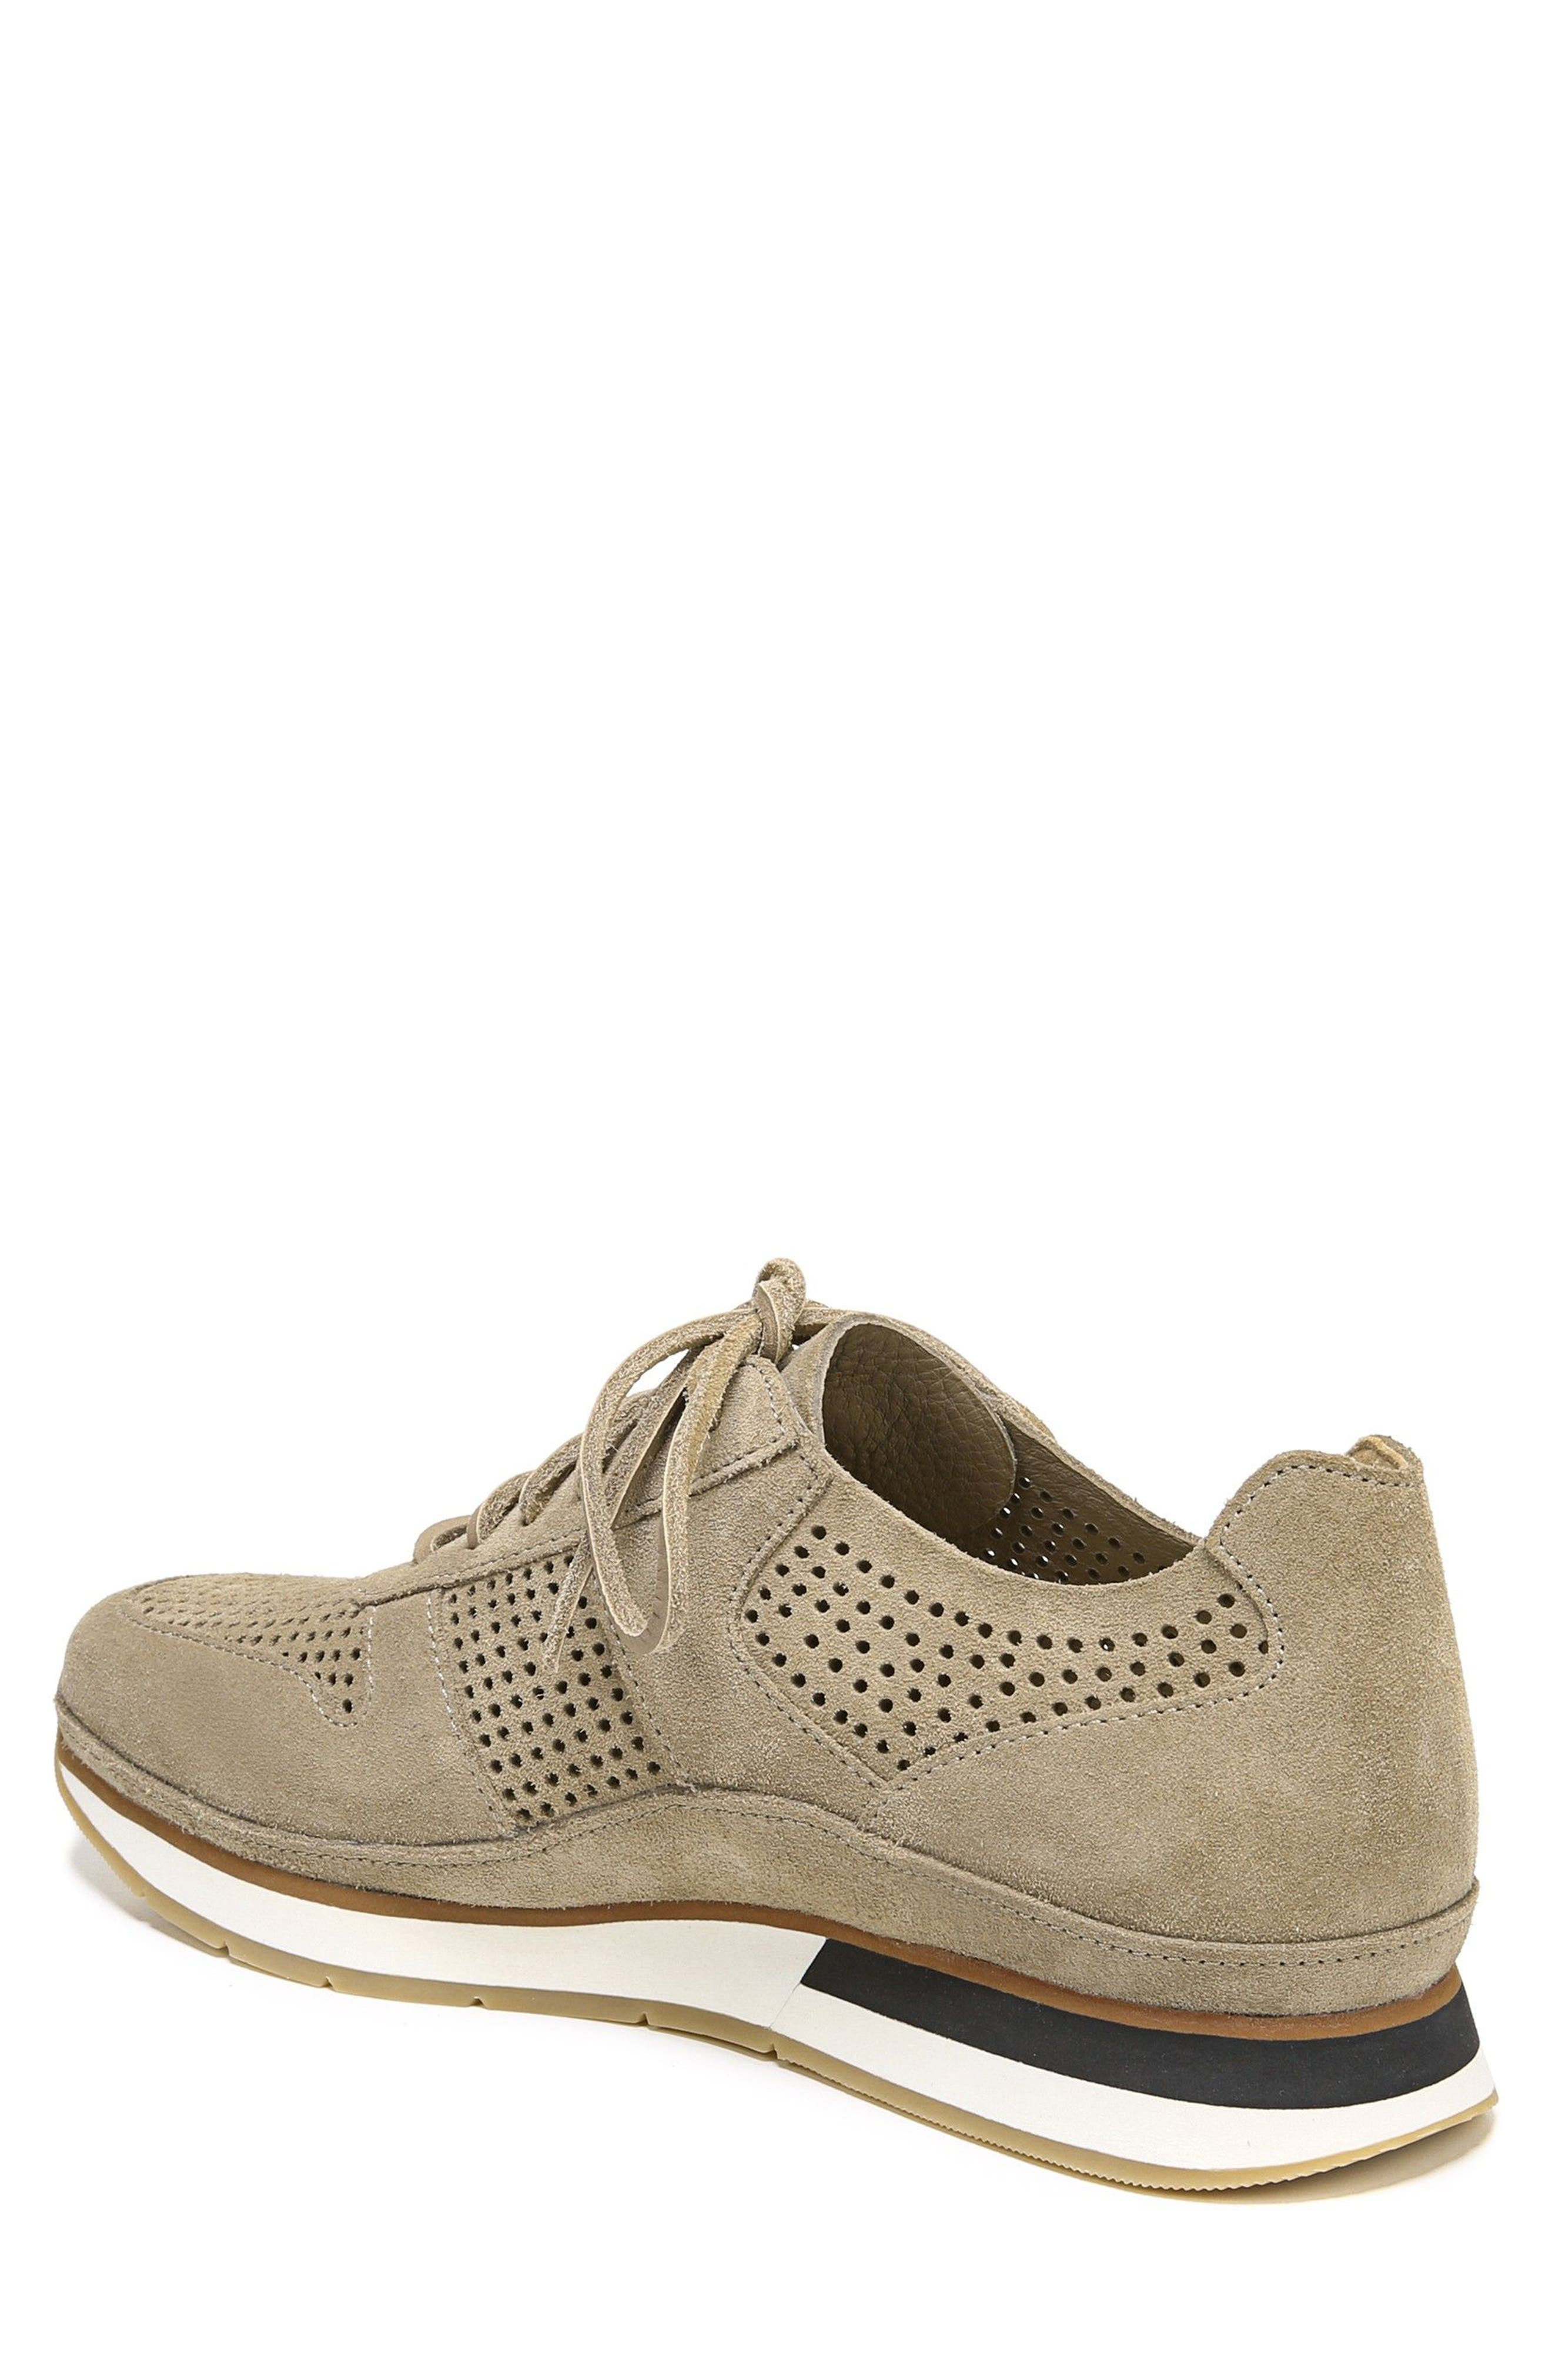 Larson Perforated Sneaker,                             Alternate thumbnail 2, color,                             250